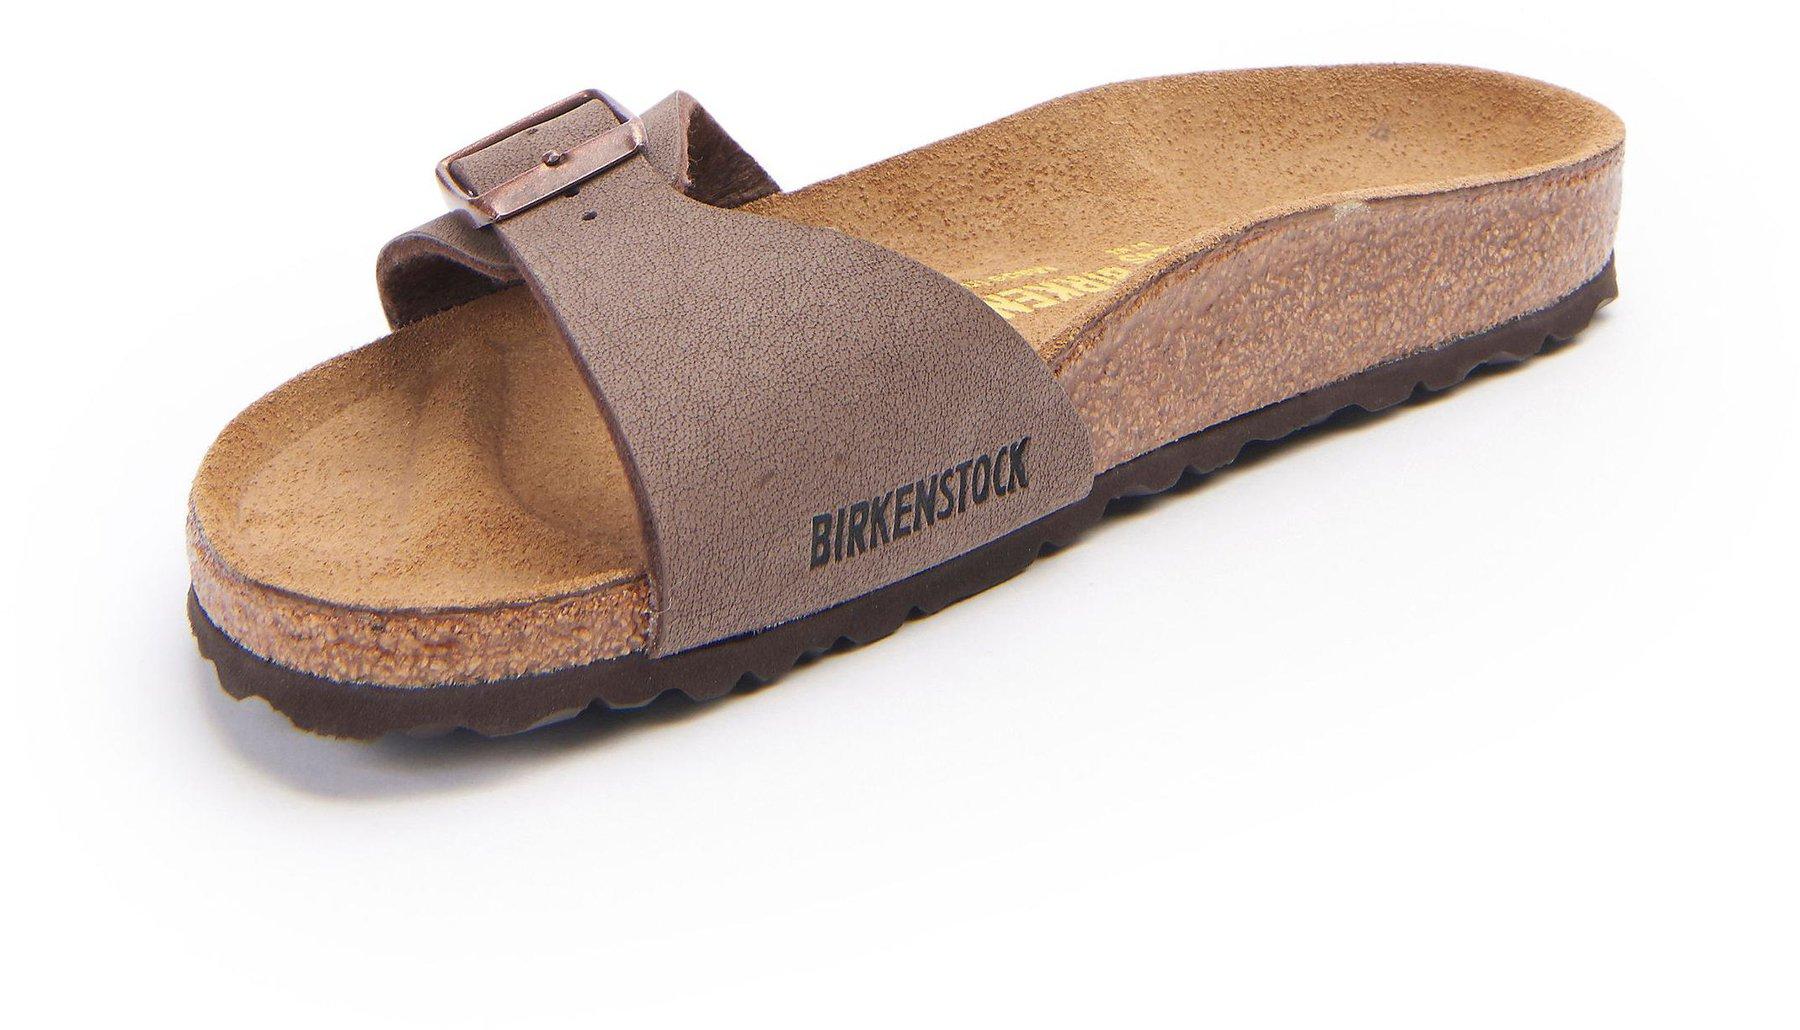 508194c008b4 Birkenstock Madrid Birko Flor mocca günstig online kaufen✓